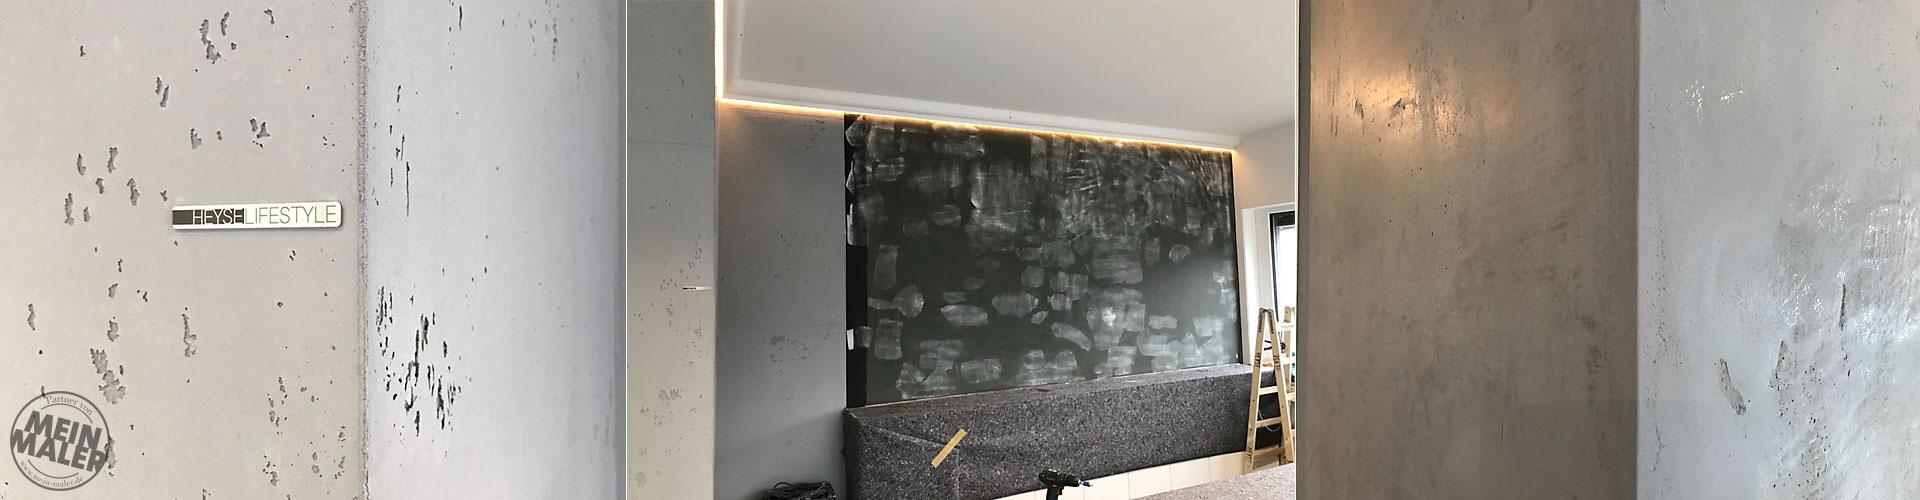 Sichtbeton Betonschalungsfuge Stuck NMC Homedecor Betonoptik Magnetwand Tafellack LED Lichdesign 09